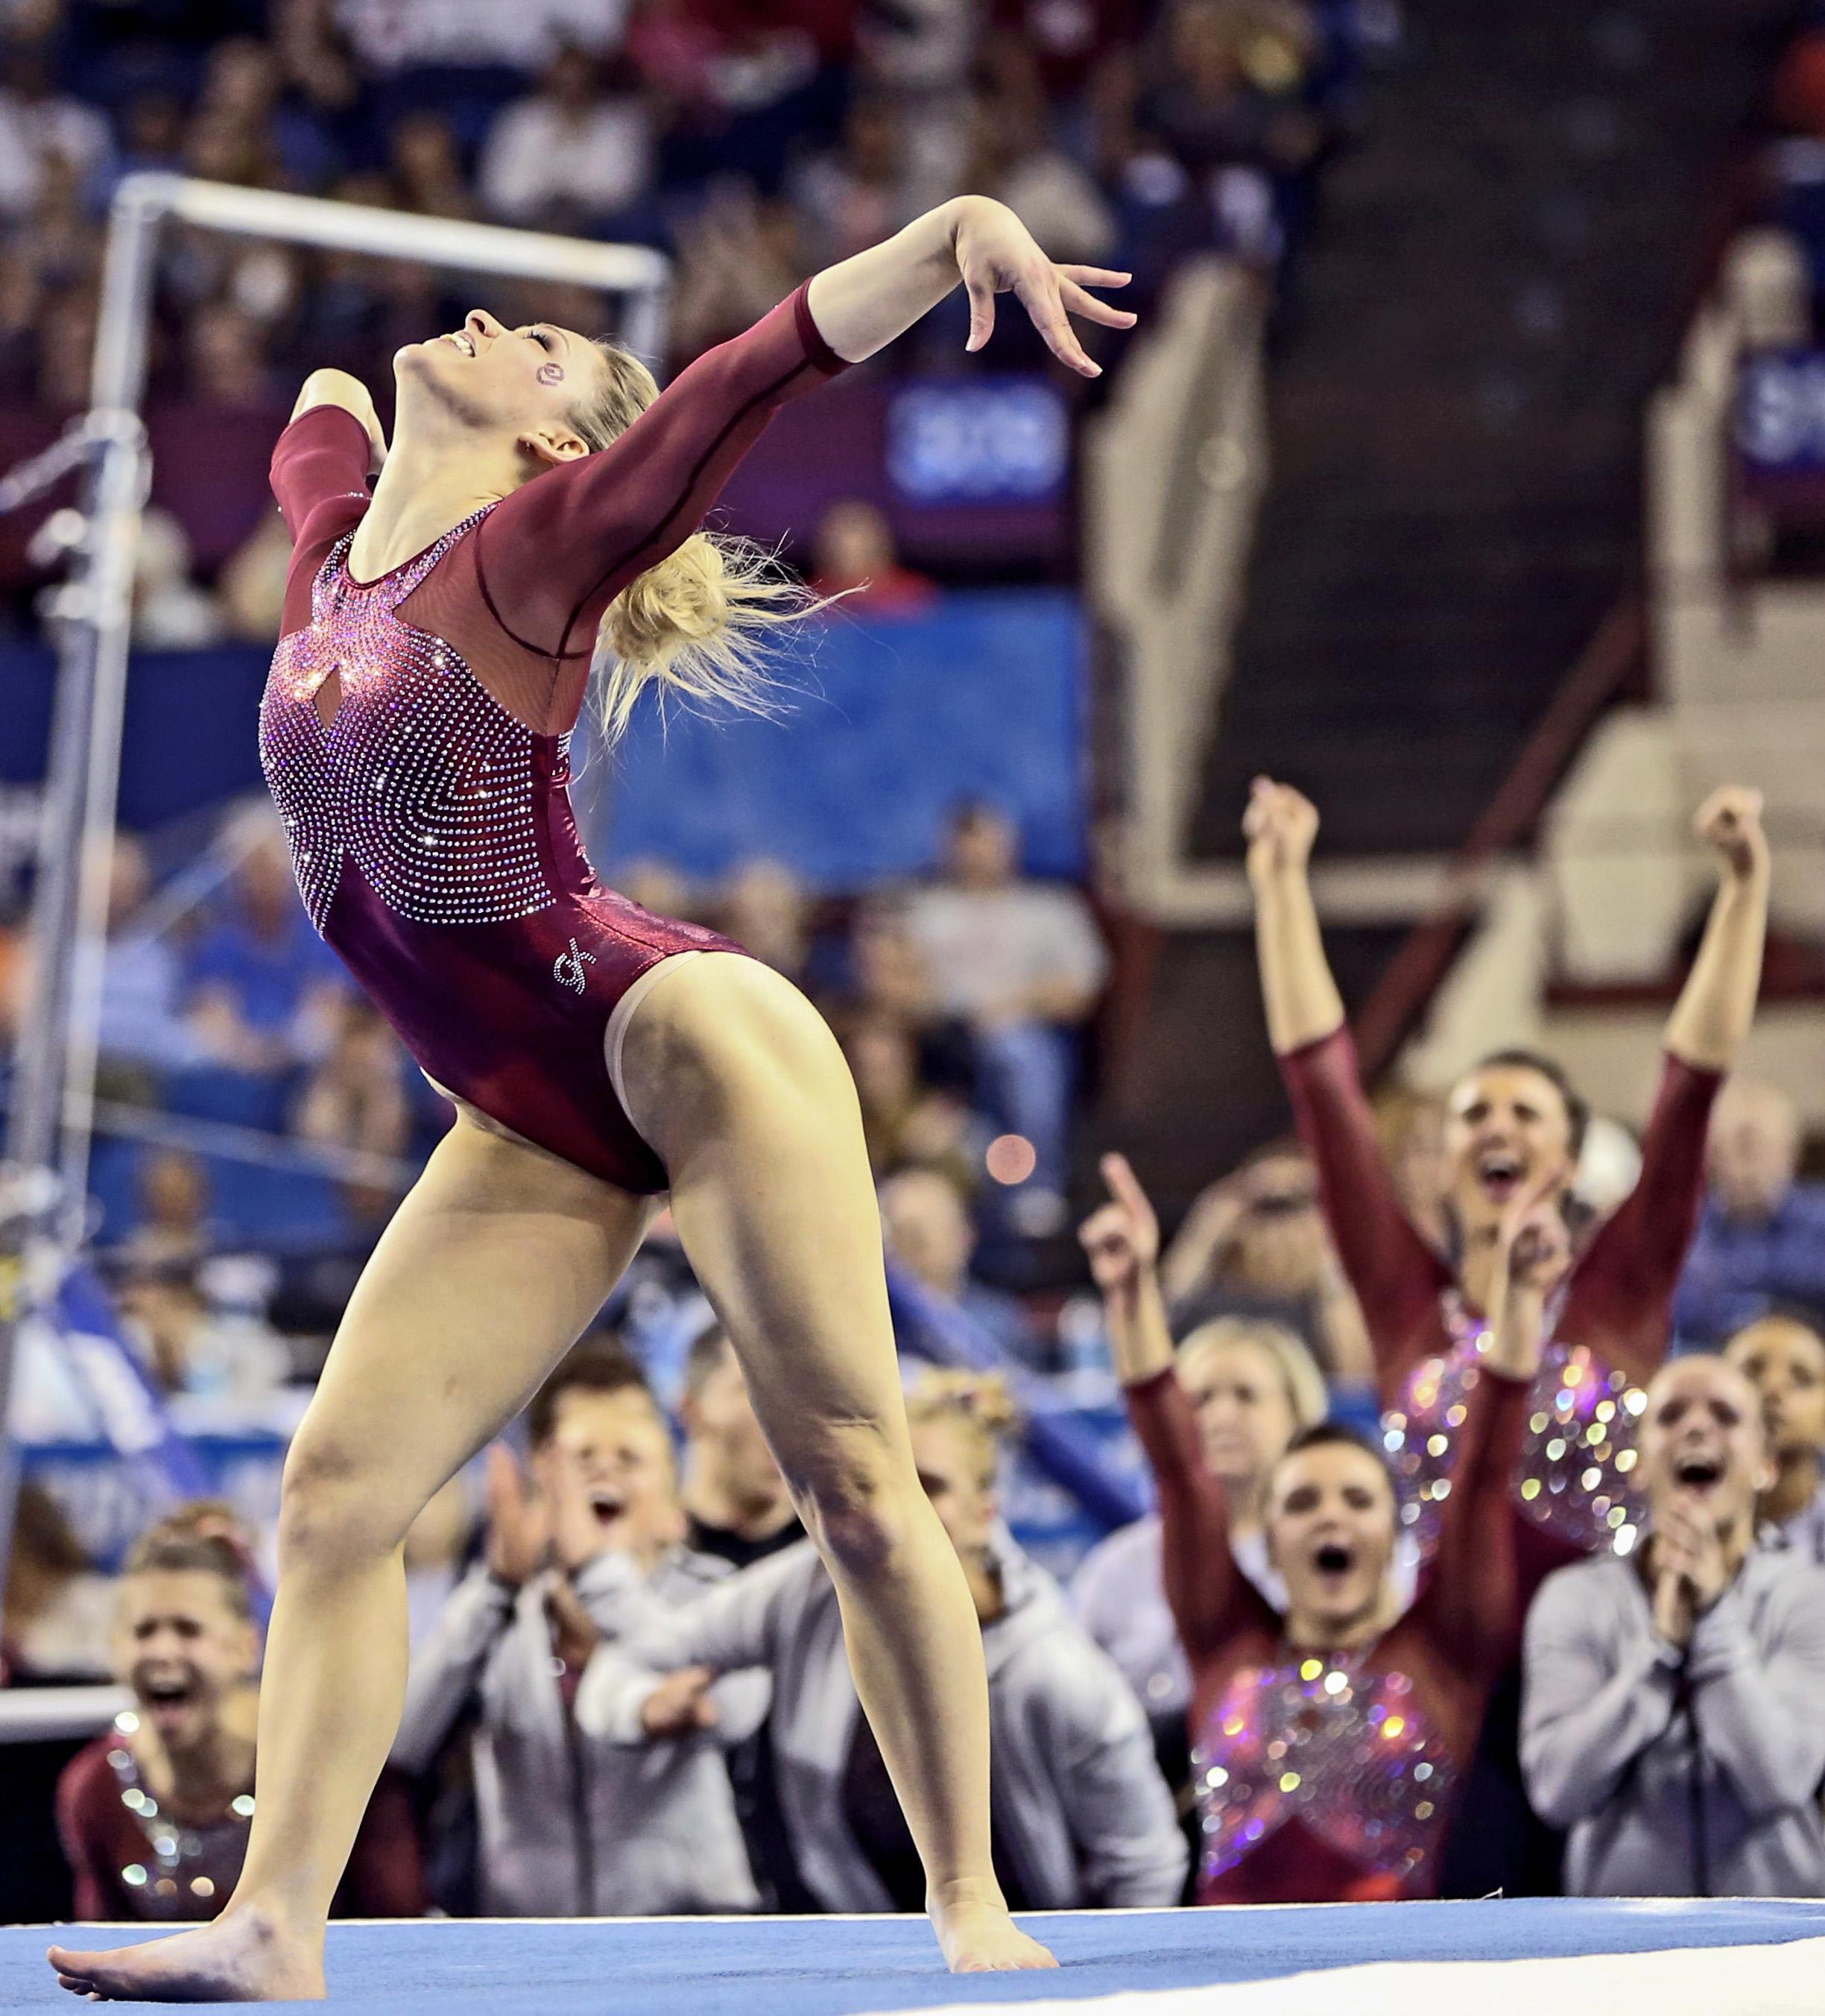 Oklahoma Gymnastics Tops the Charts - Both Men and Women